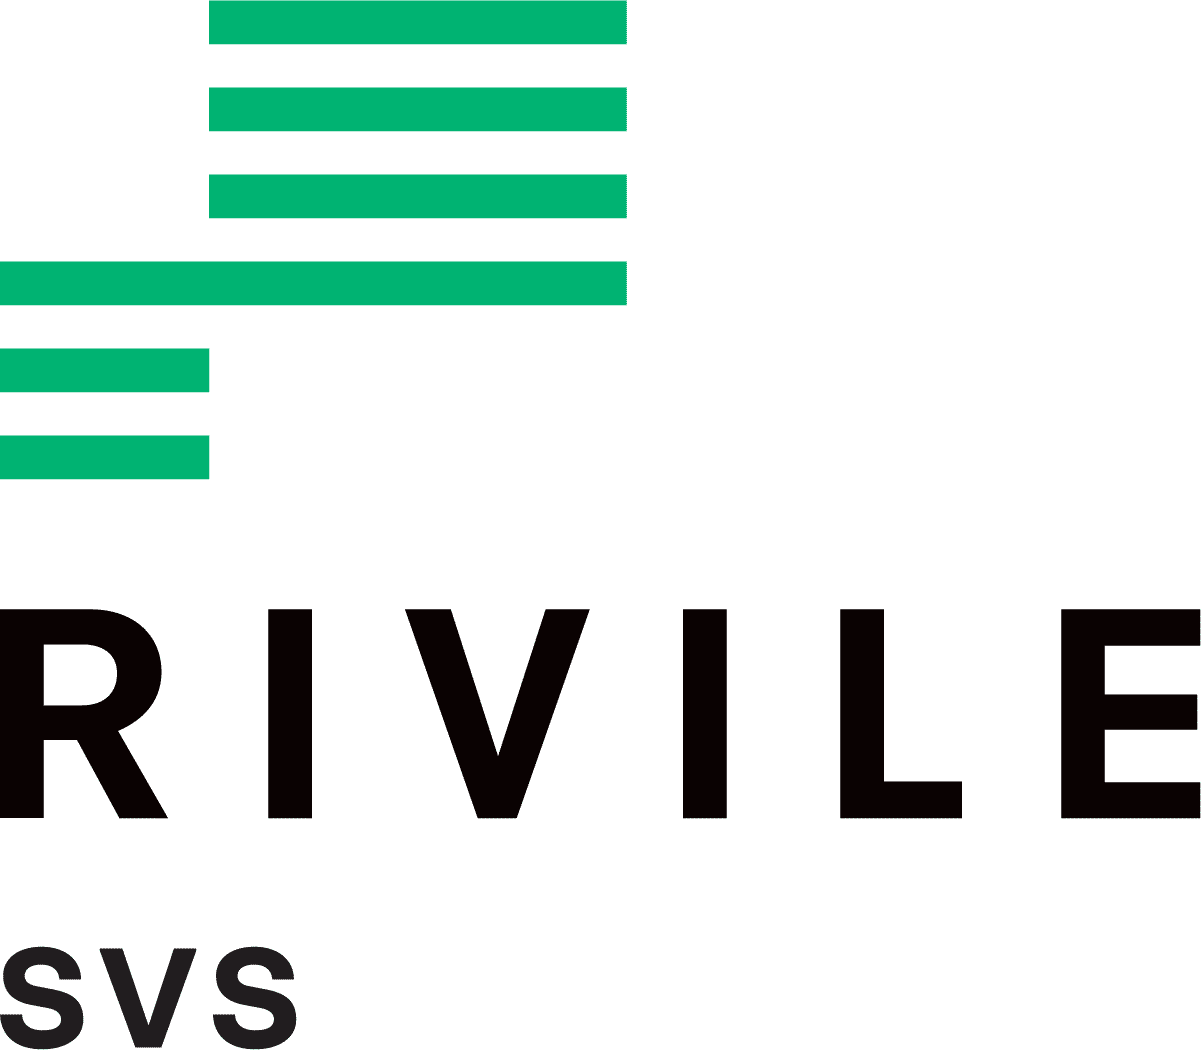 Rivile SVS logotipas zalia juoda